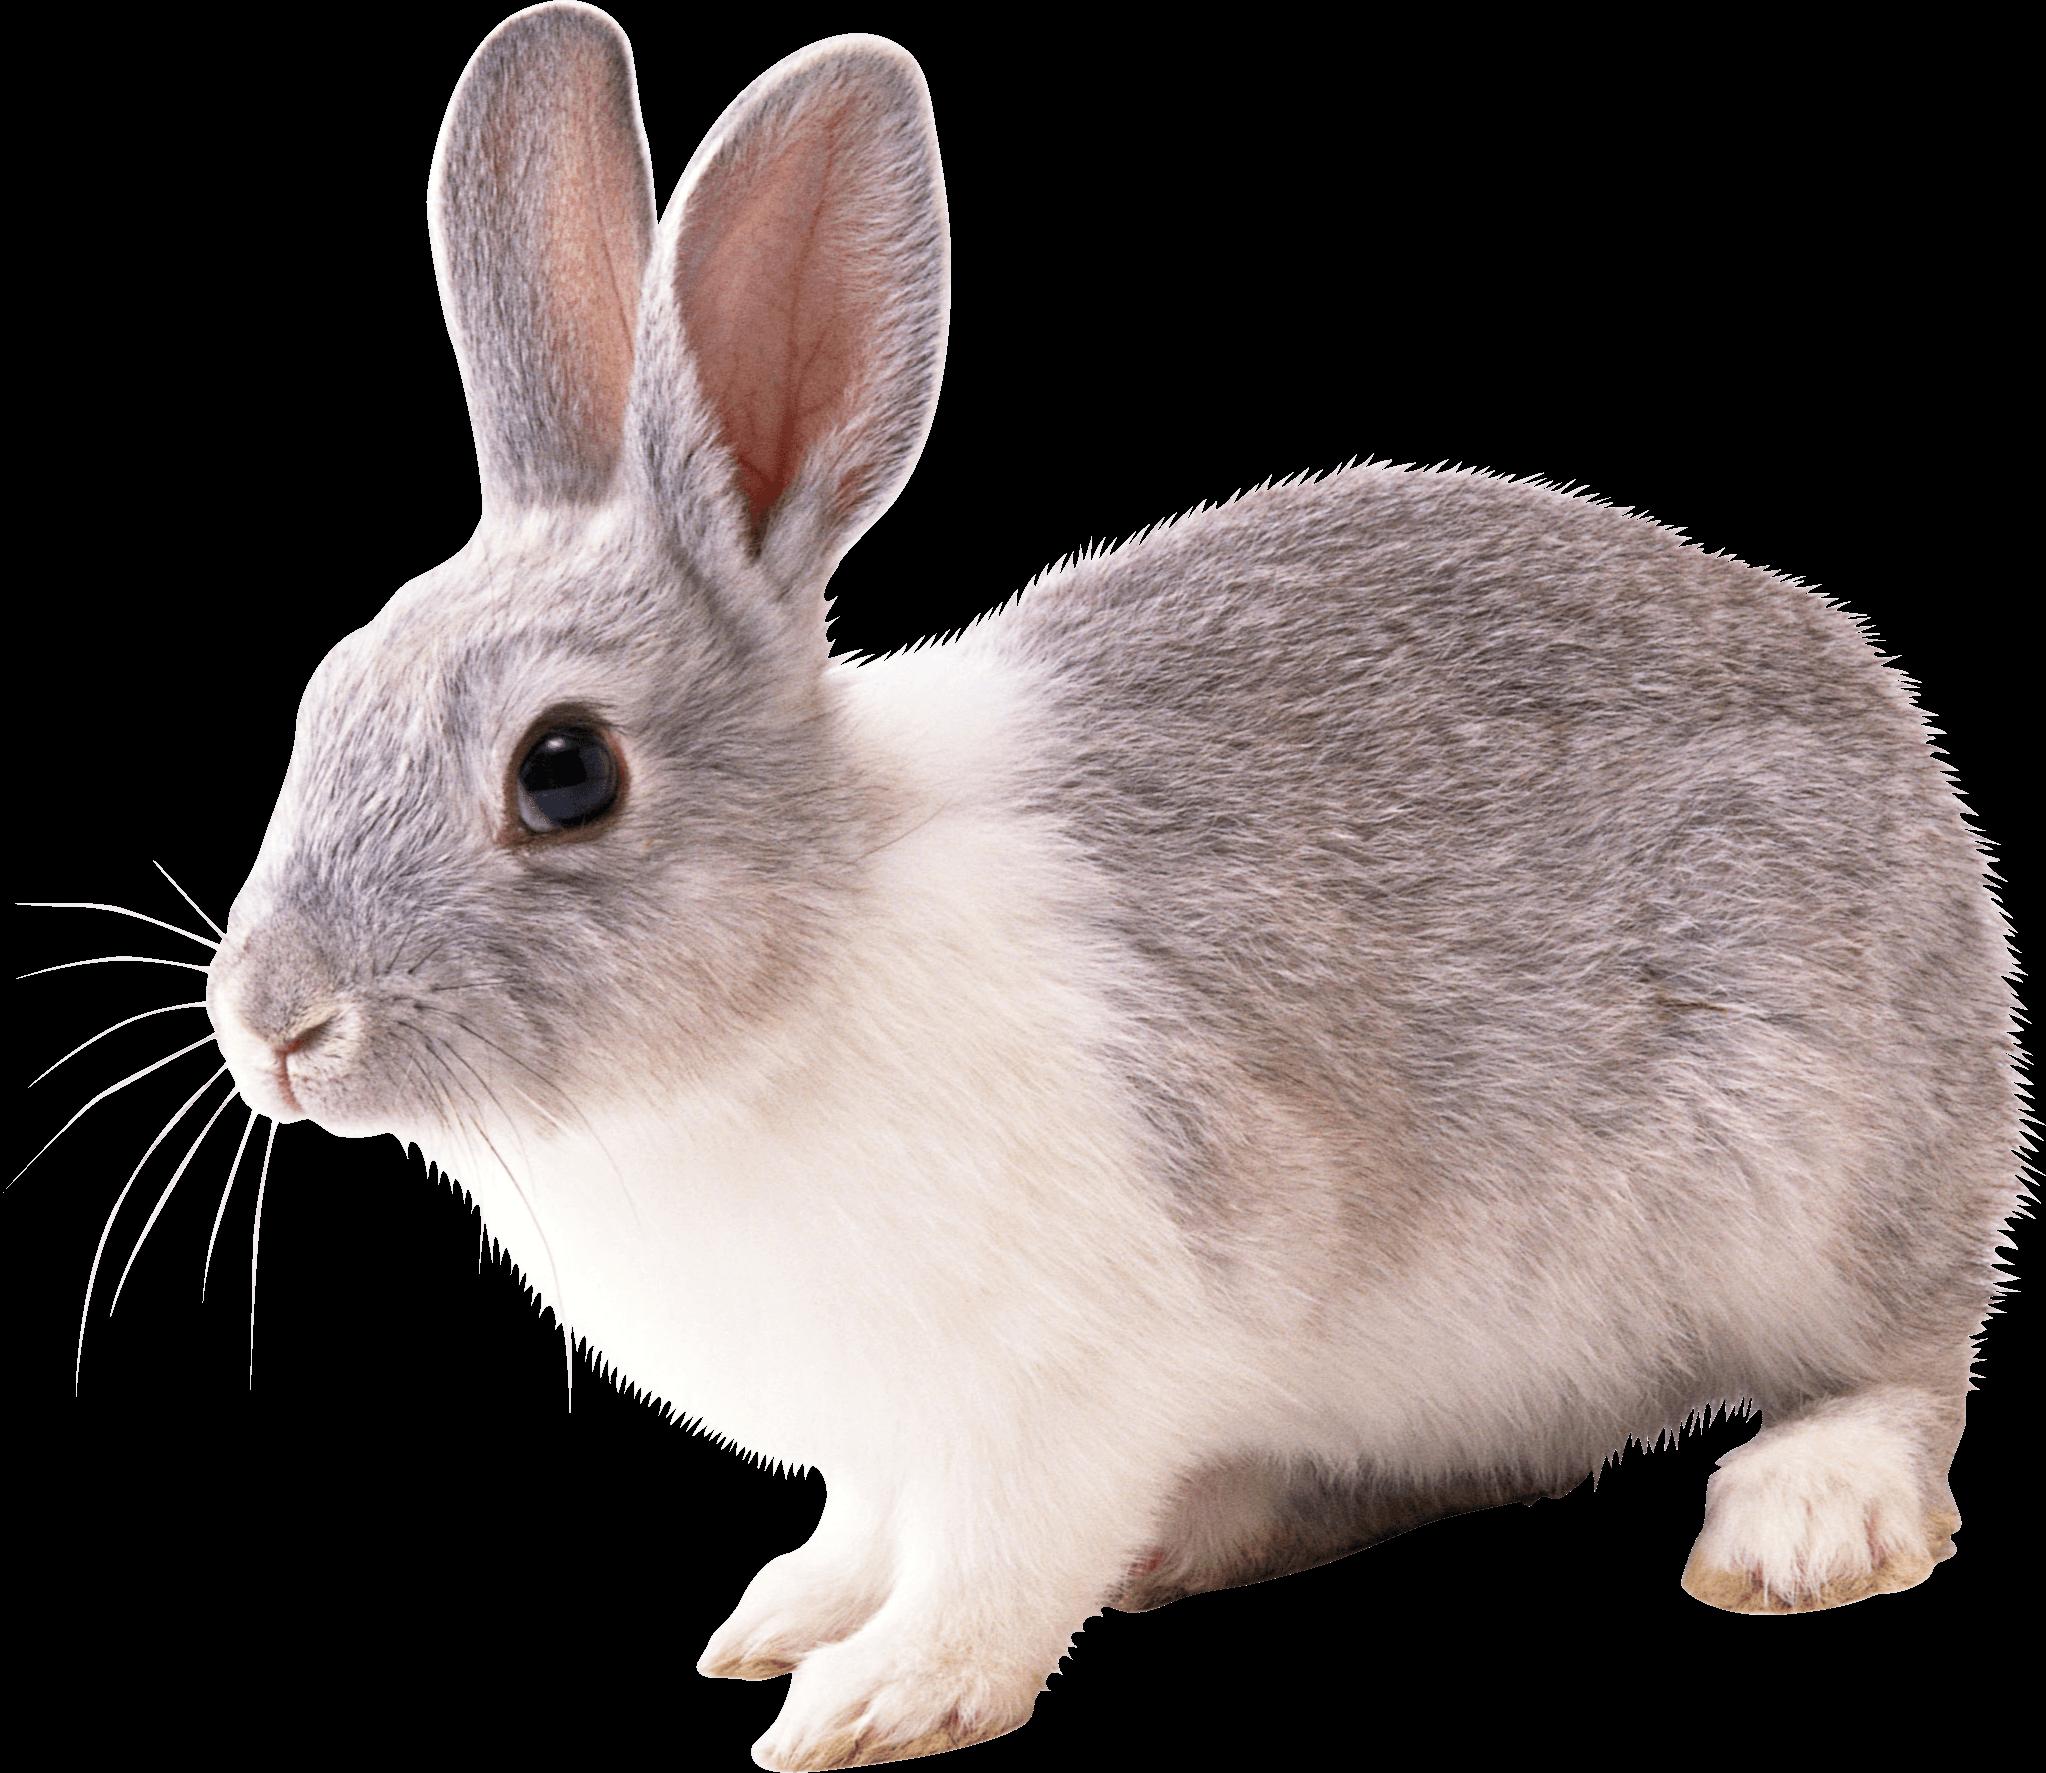 Rabbit PNG - 2860